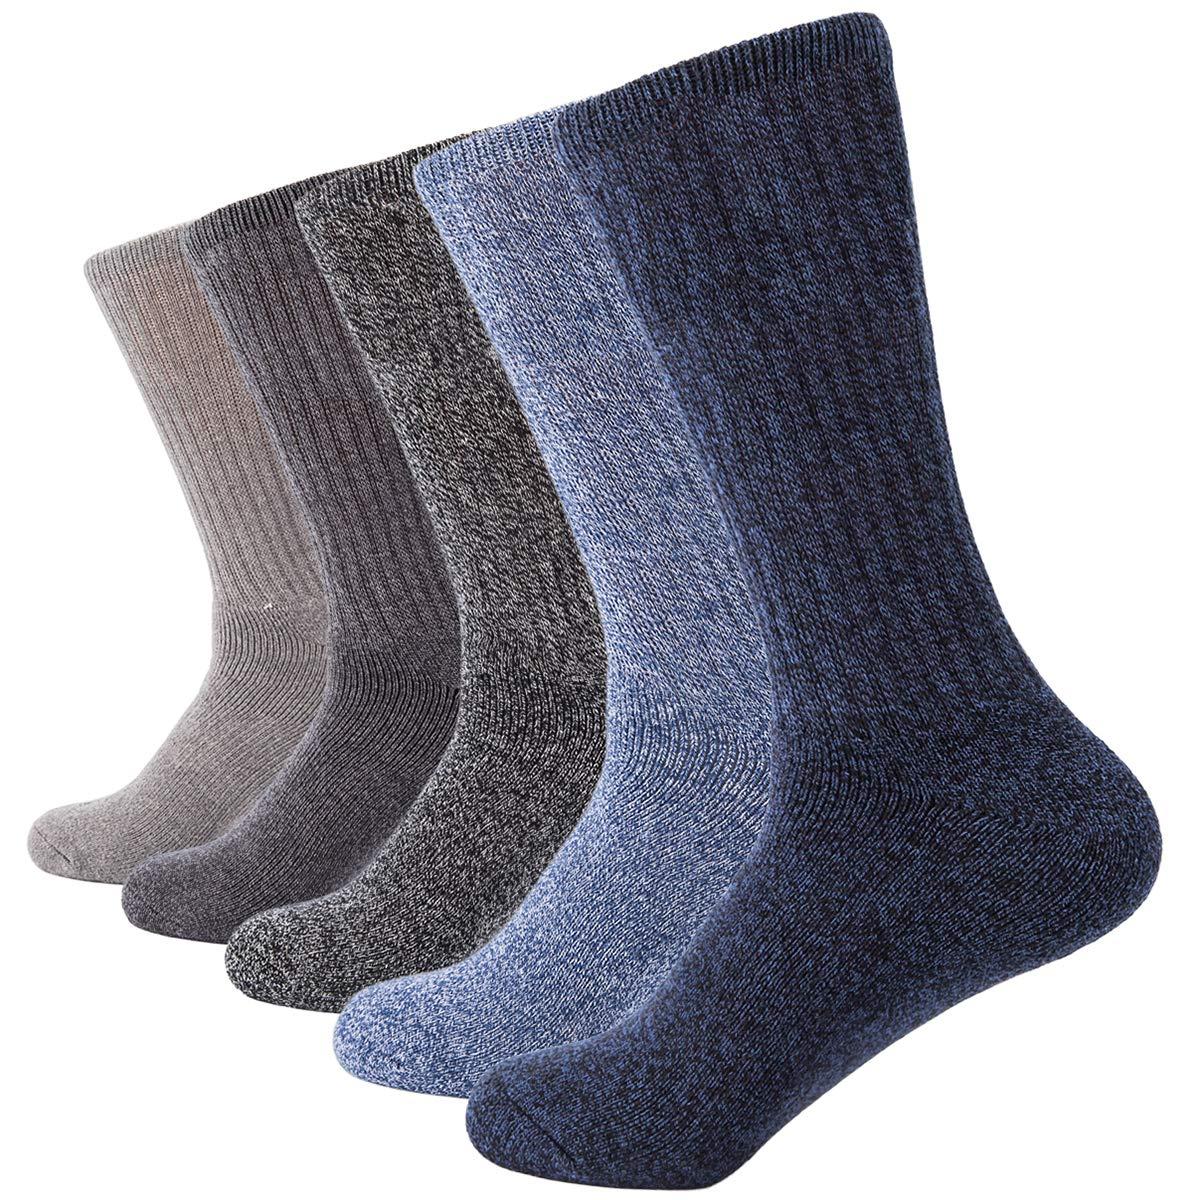 Multicolor AIRSTROLL 5 Pack Crew Socks for Men Women Casual Knit Cotton Dress Socks